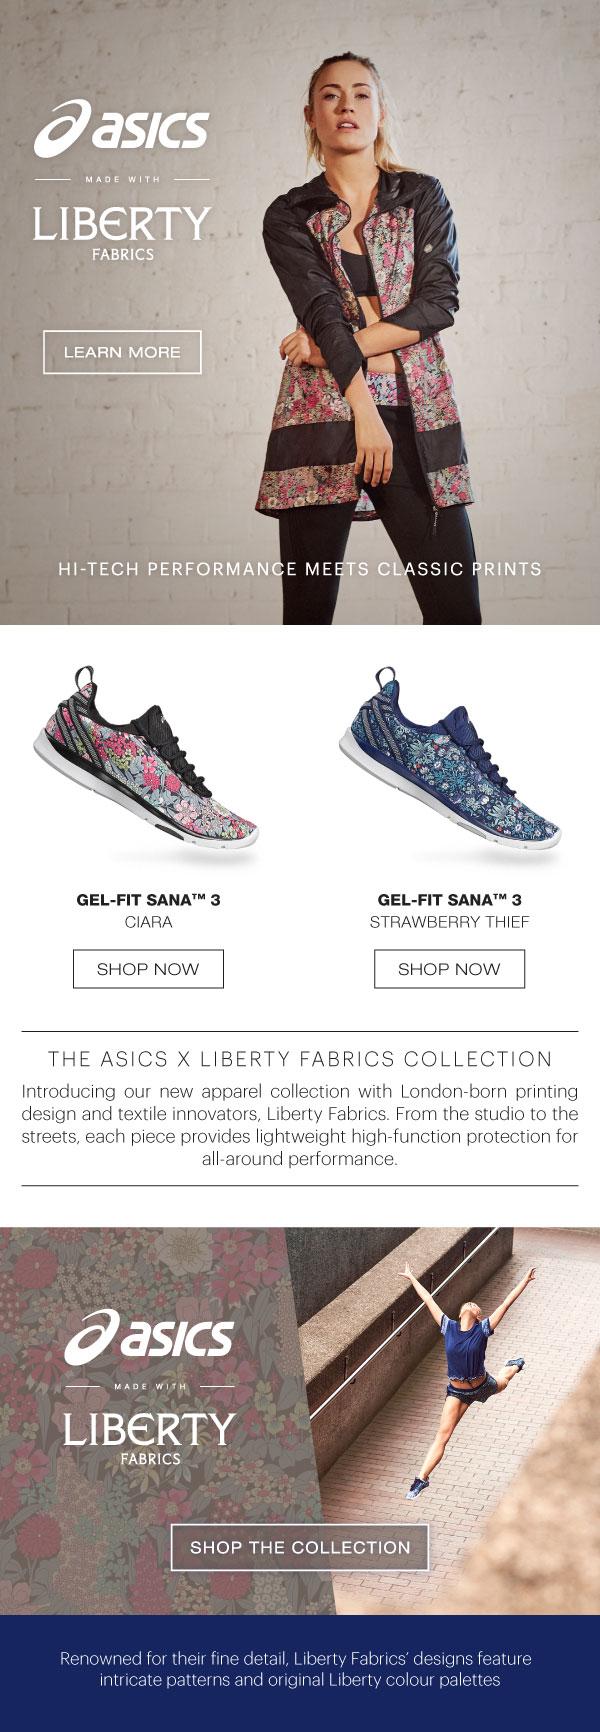 Asics with Liberty Fabrics workout pants - on Superbase Creative